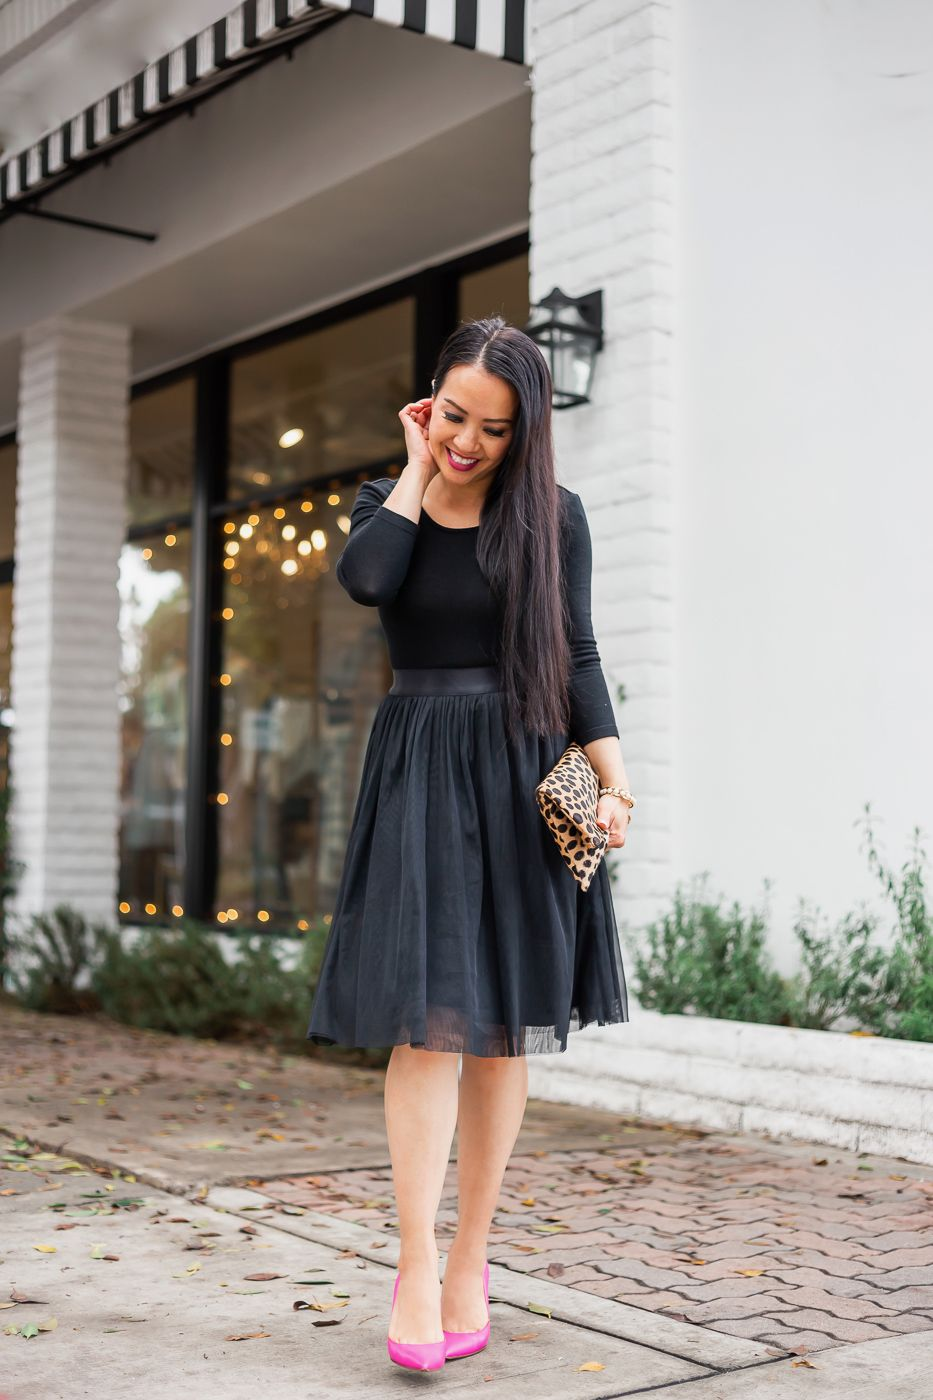 Black Tulle Skirt Dress Leopard Clutch Pink Pumps Stylish Petite Tulle Skirt Dress Black Tulle Dress Tulle Skirt Black [ 1400 x 933 Pixel ]